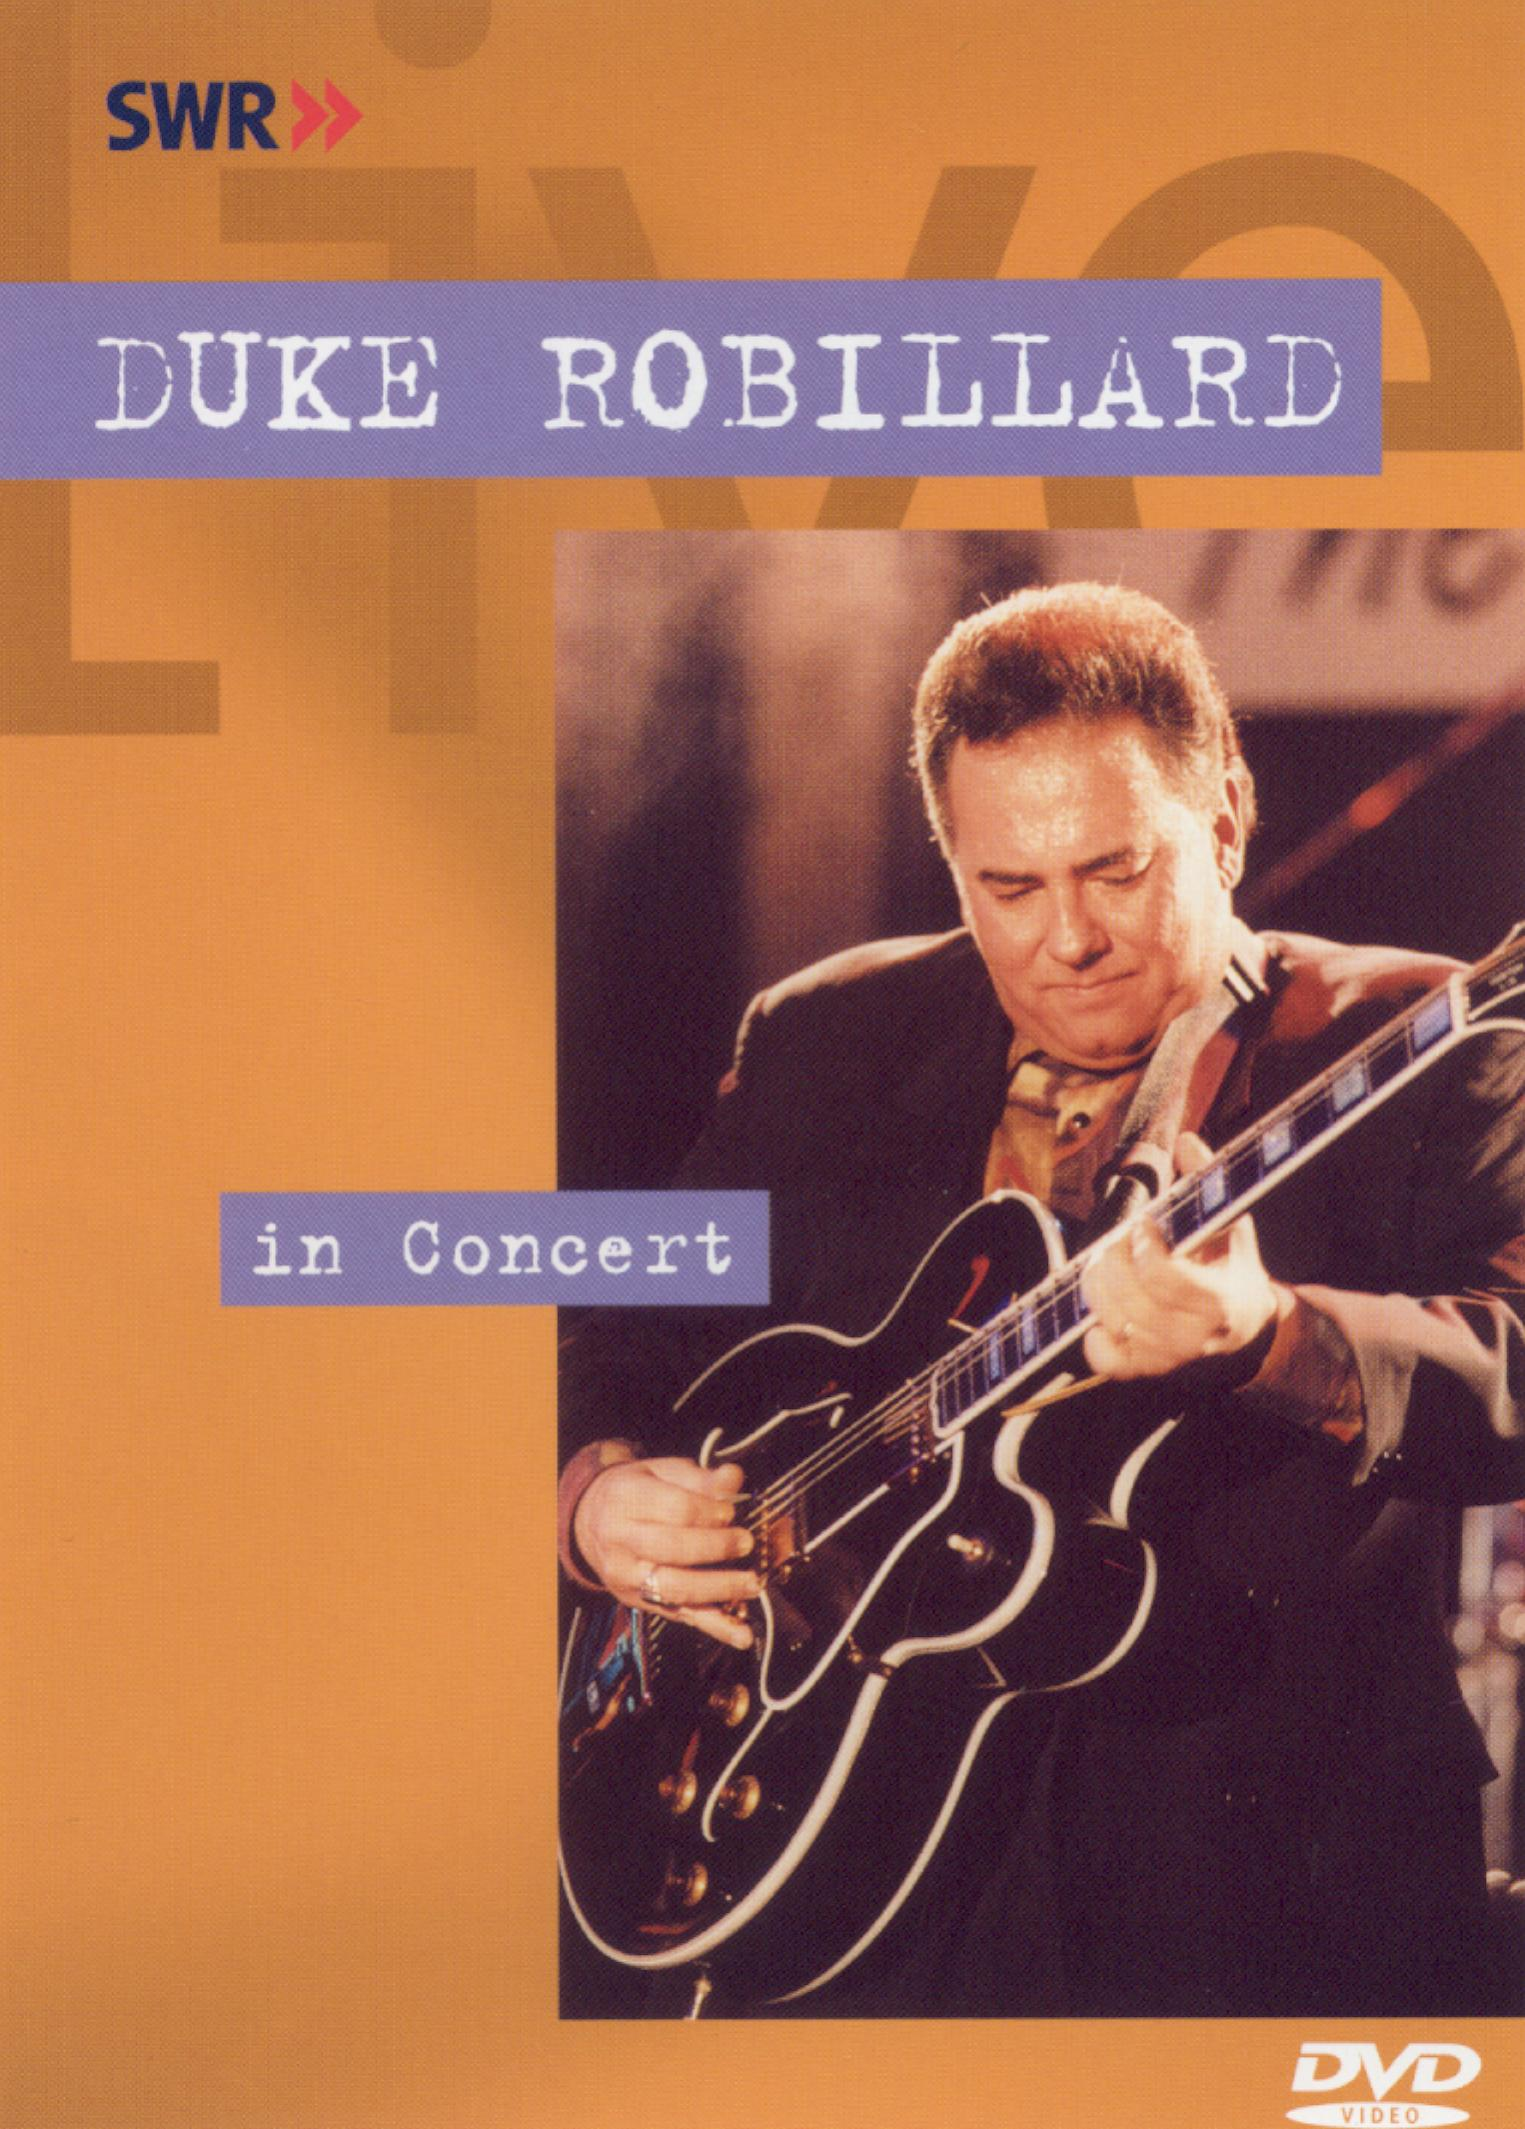 Ohne Filter - Musik Pur: Duke Robillard in Concert